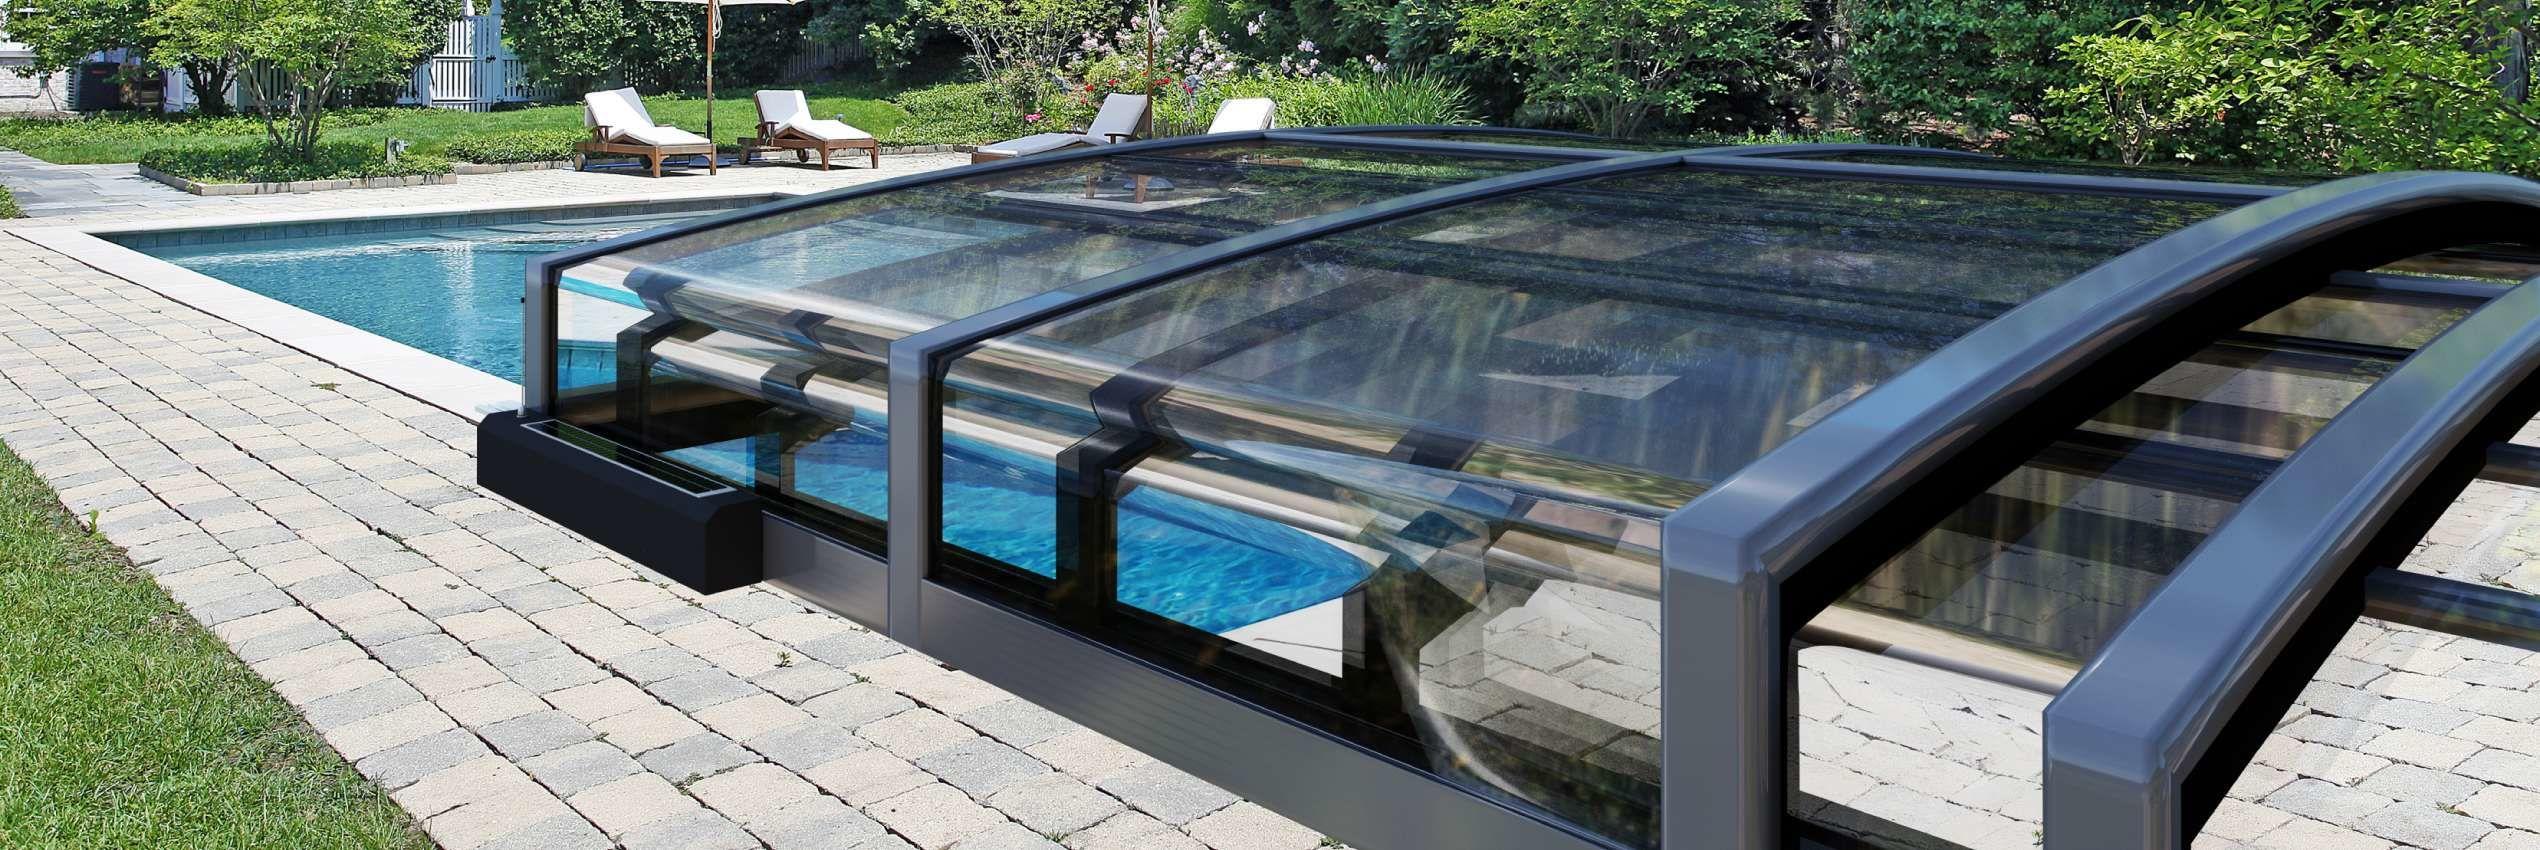 hero-pool-enclosure-viva-prime-conkover-02